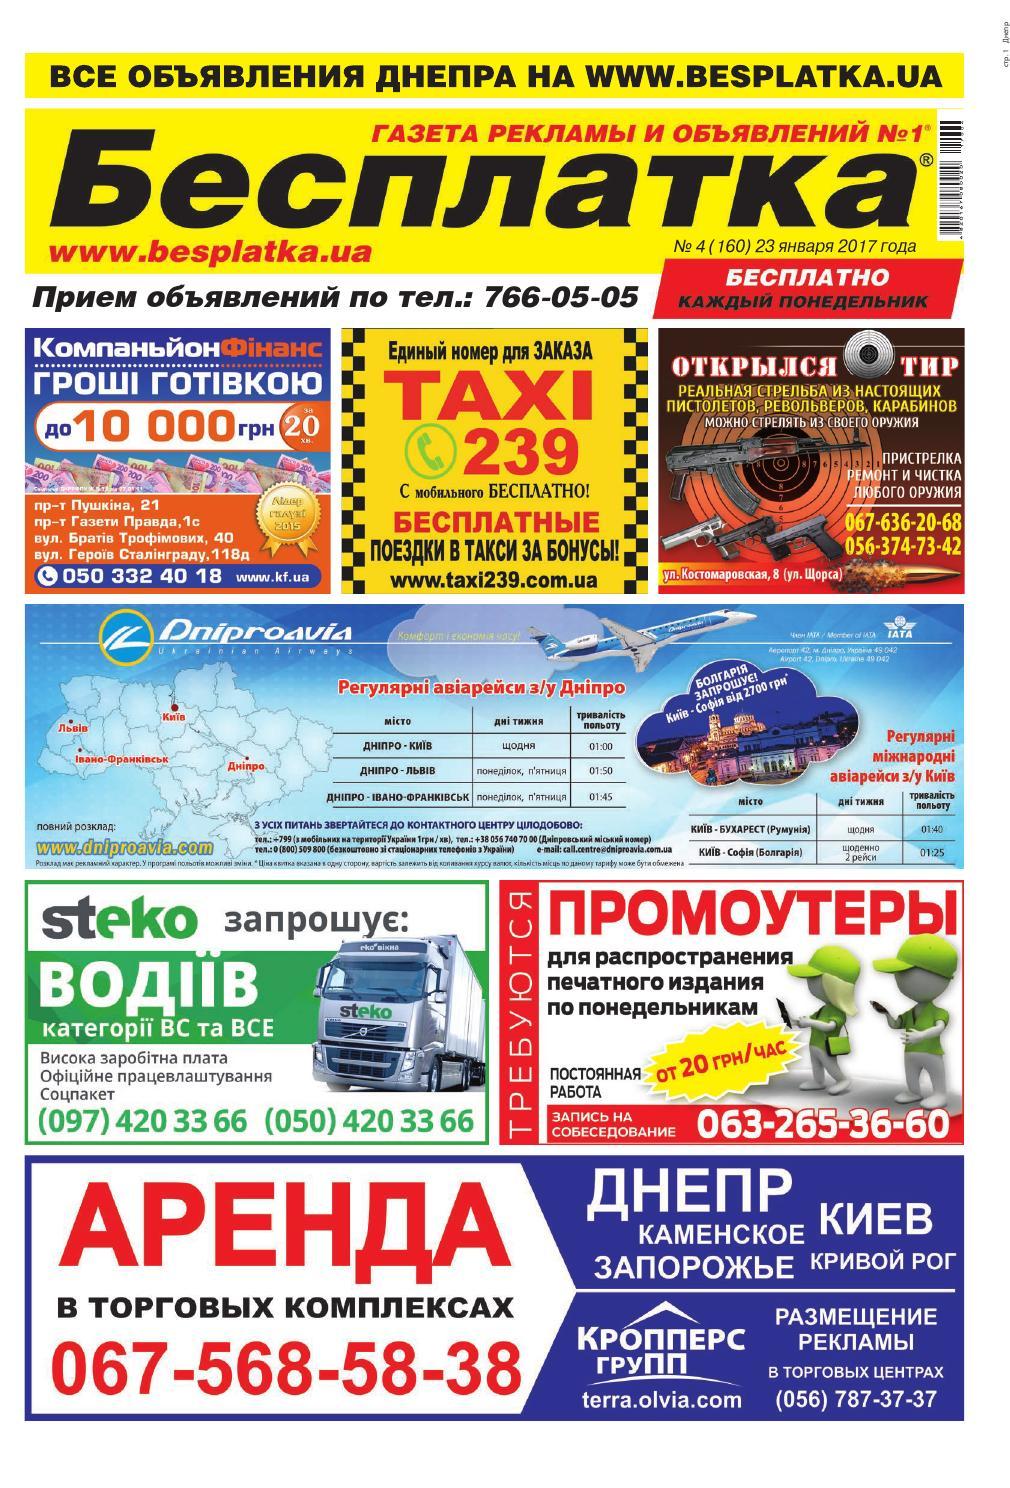 6cfd9a9fdd59 Besplatka  4 Днепр by besplatka ukraine - issuu